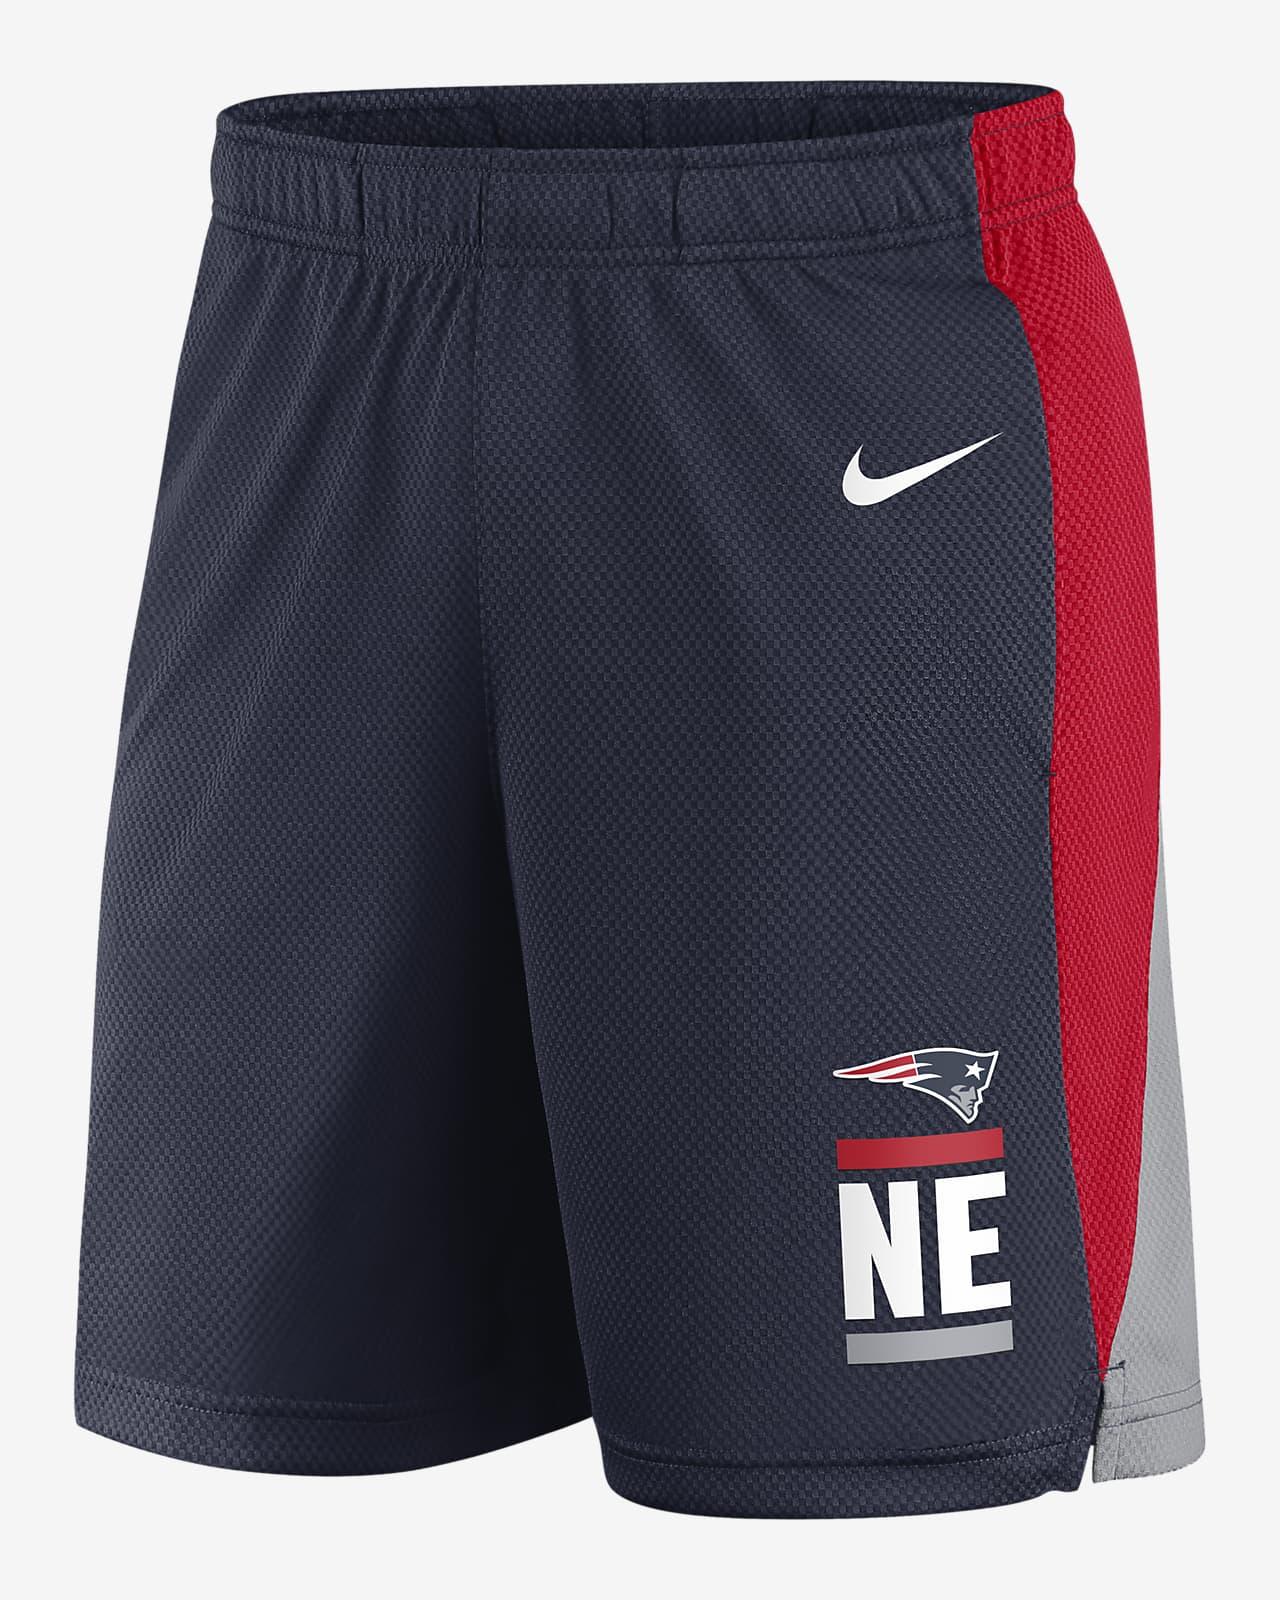 Nike Dri-FIT Broadcast (NFL New England Patriots) Men's Shorts